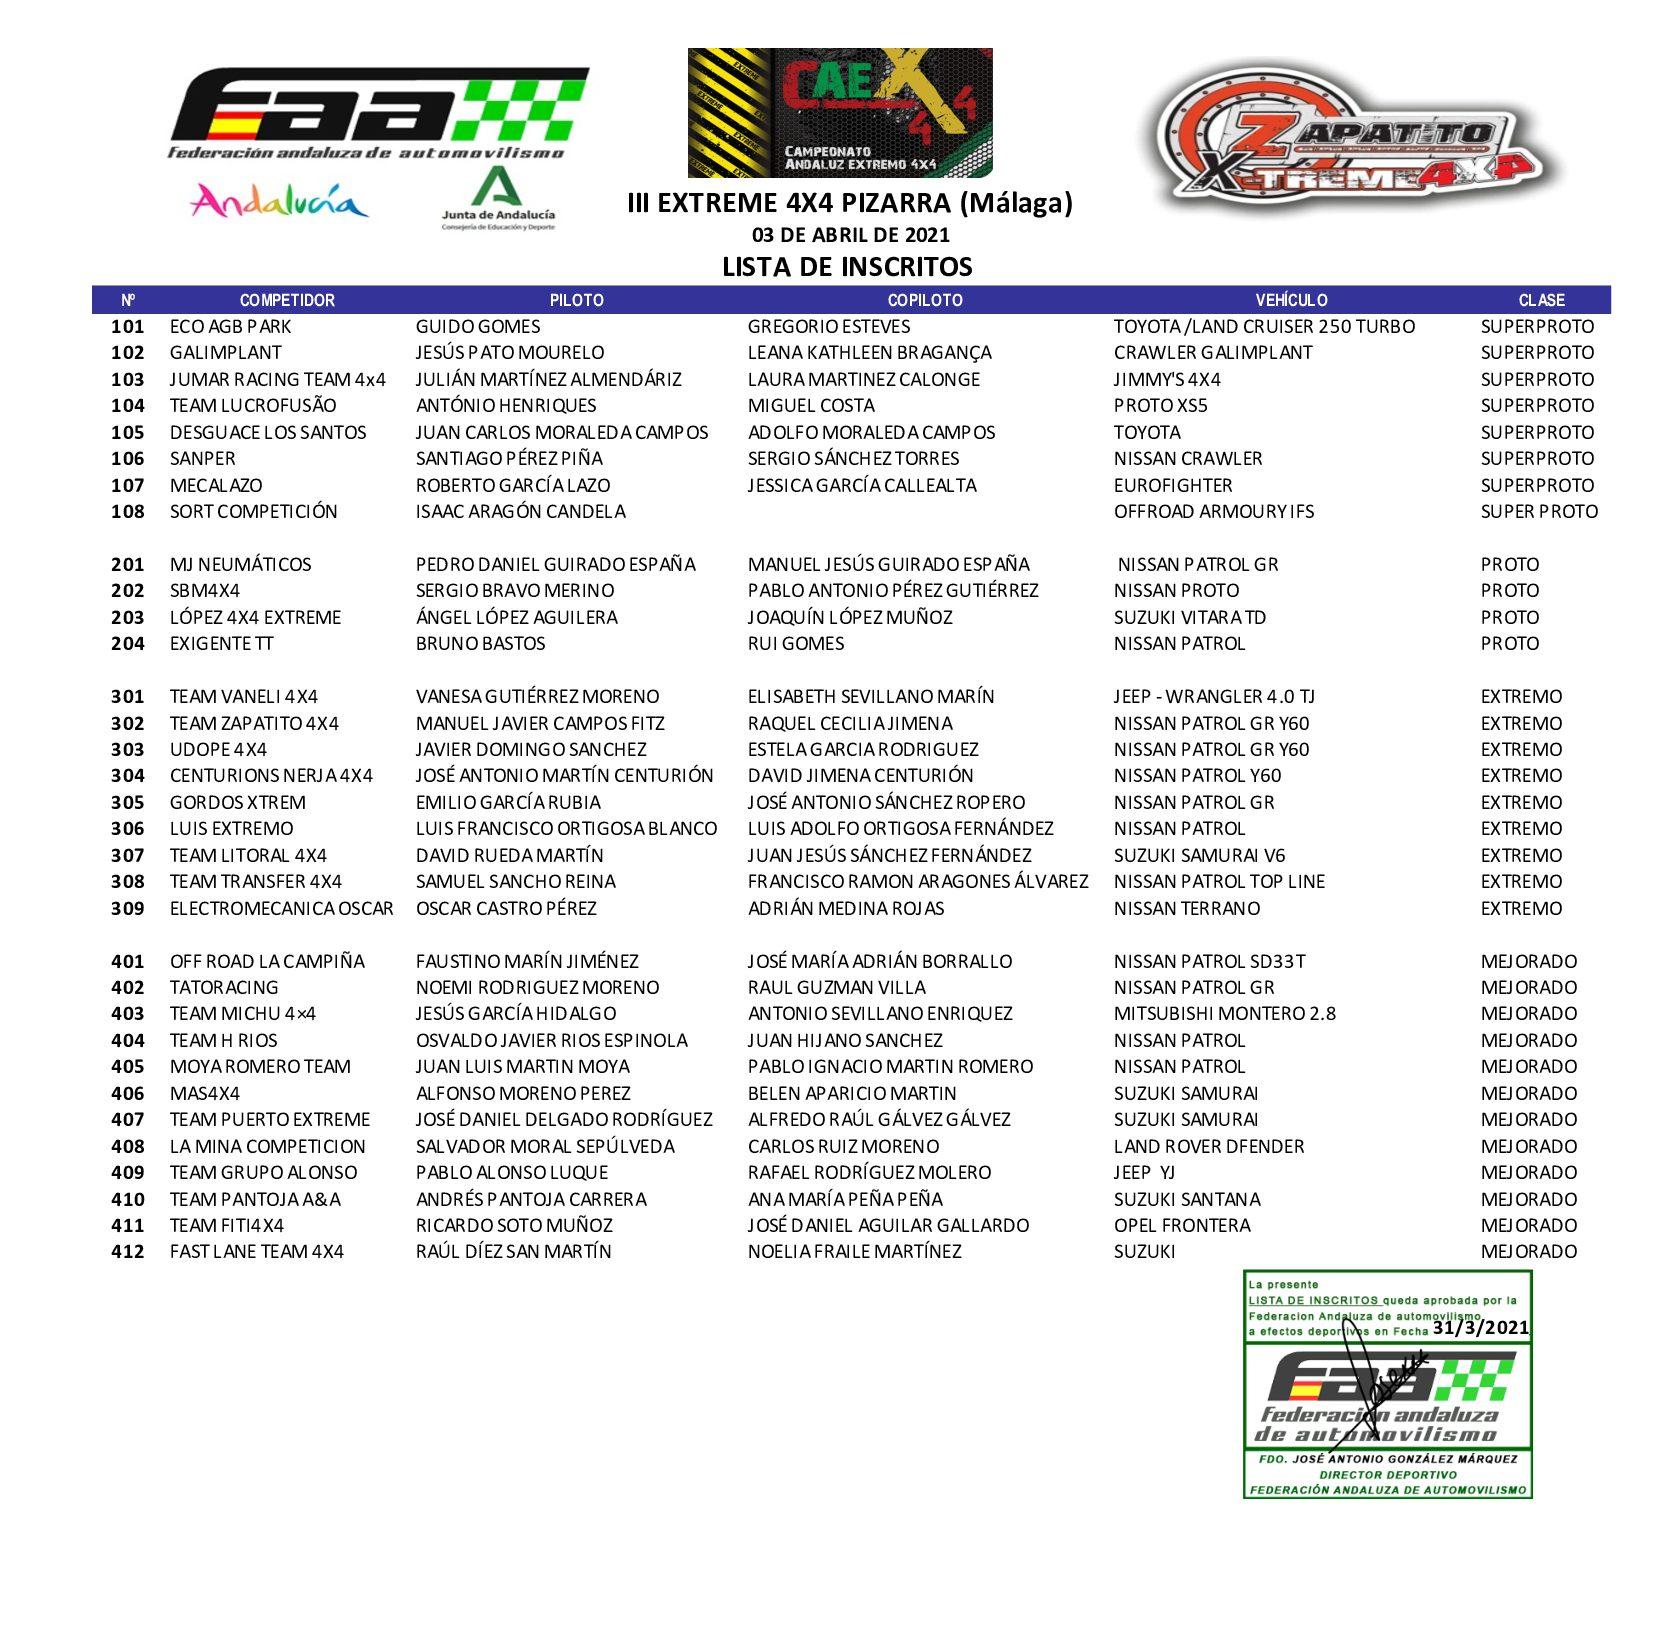 Inscritos Campeonato Andalucía Extremo 4x4 - Pizarra